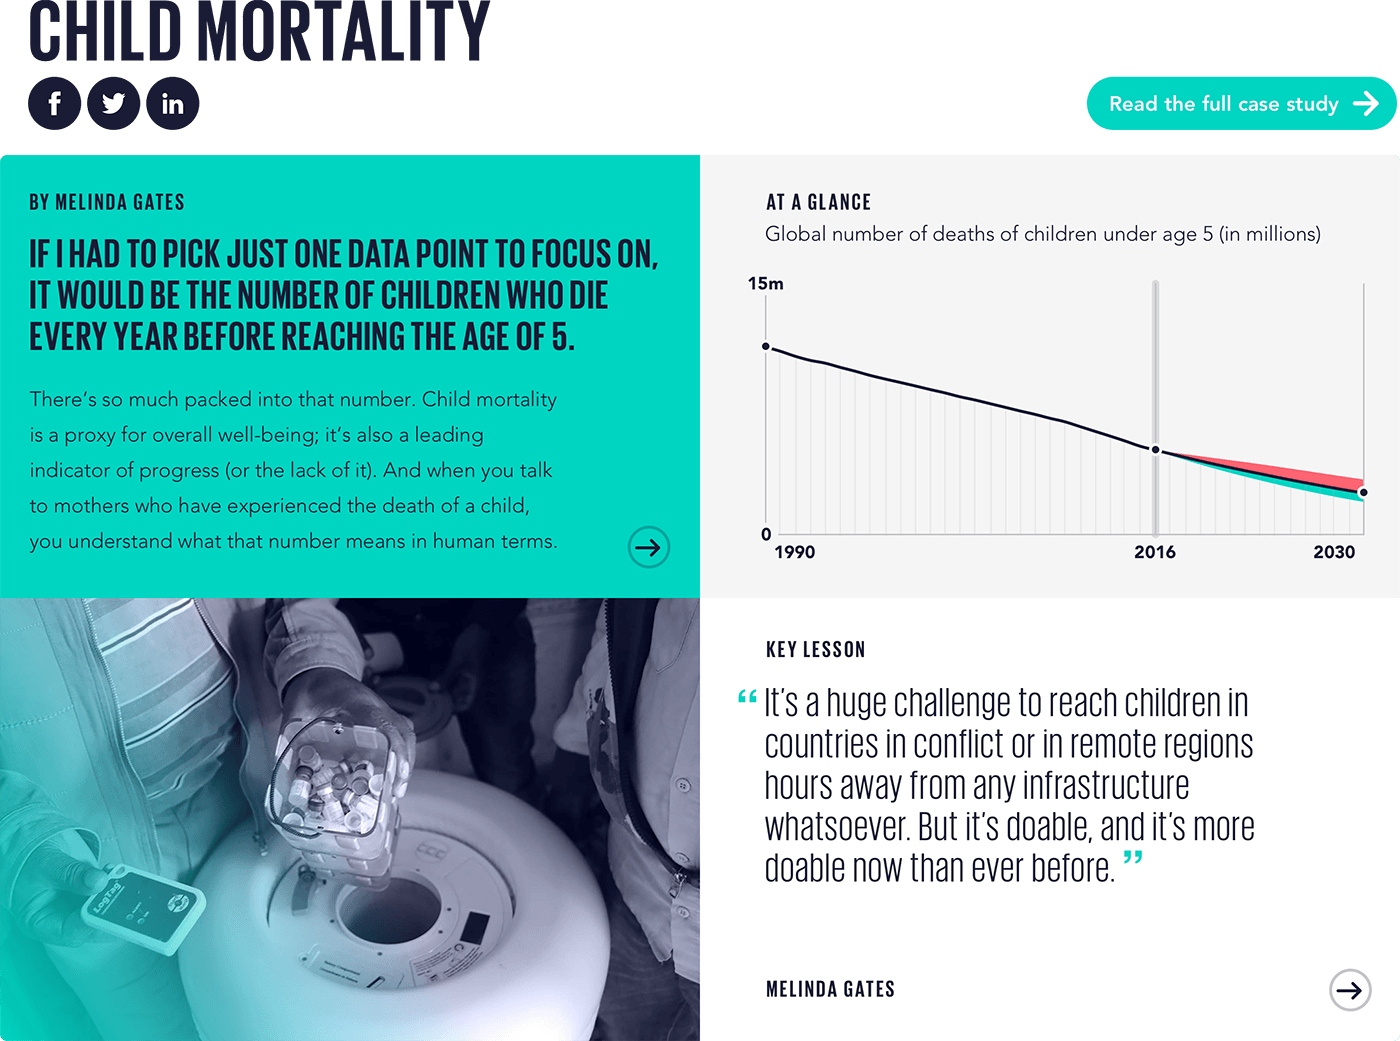 Child mortality case study promo